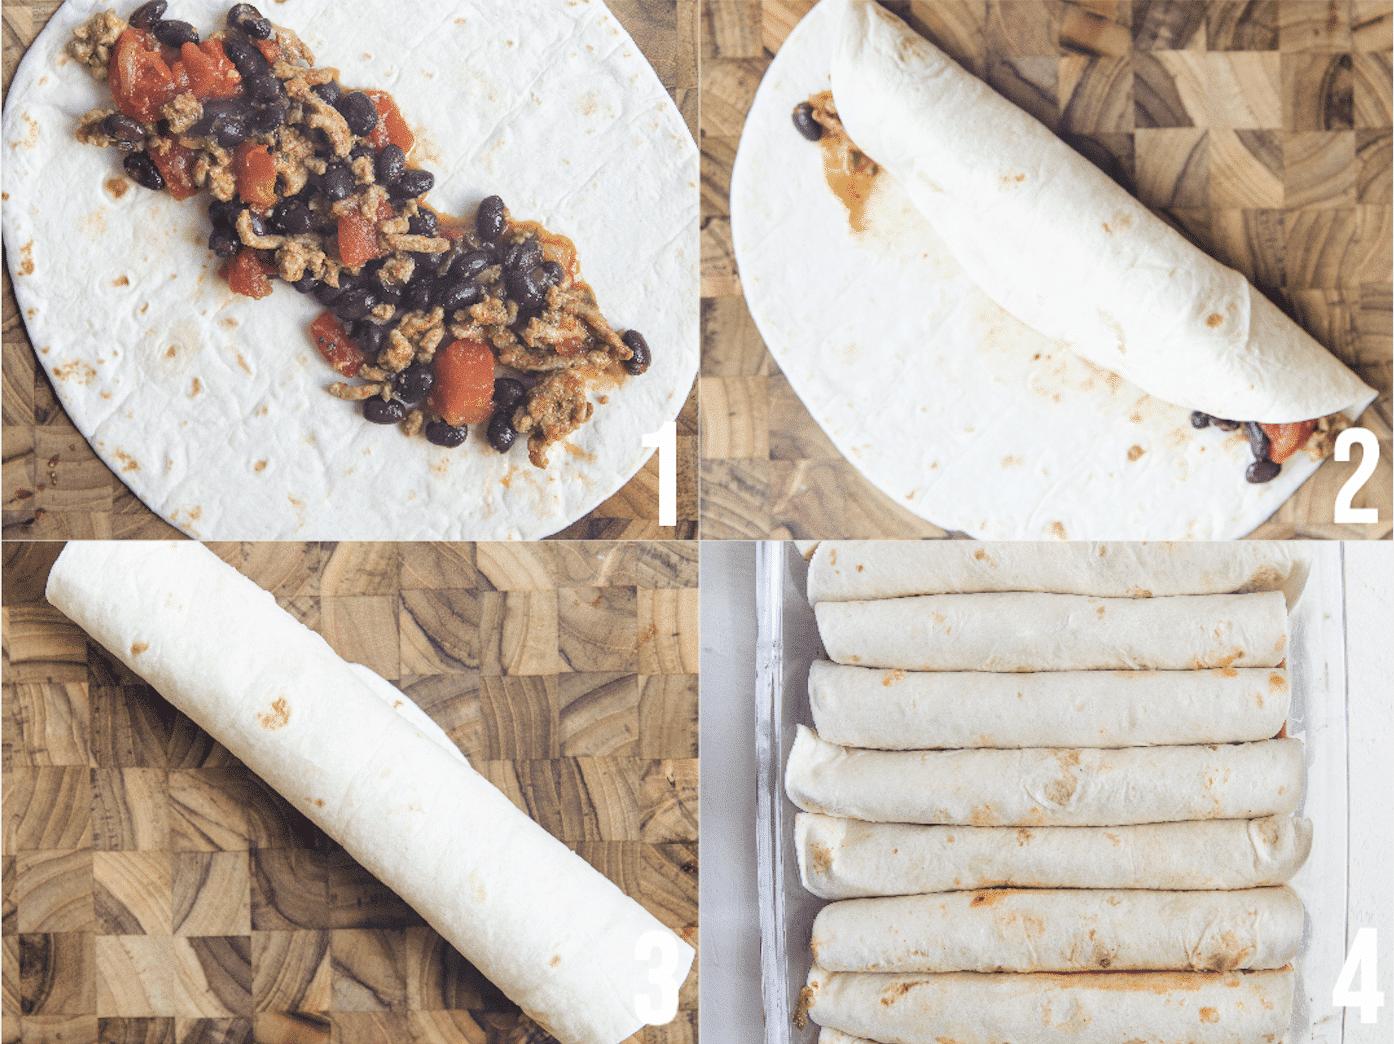 how to roll enchiladas using a flour tortilla